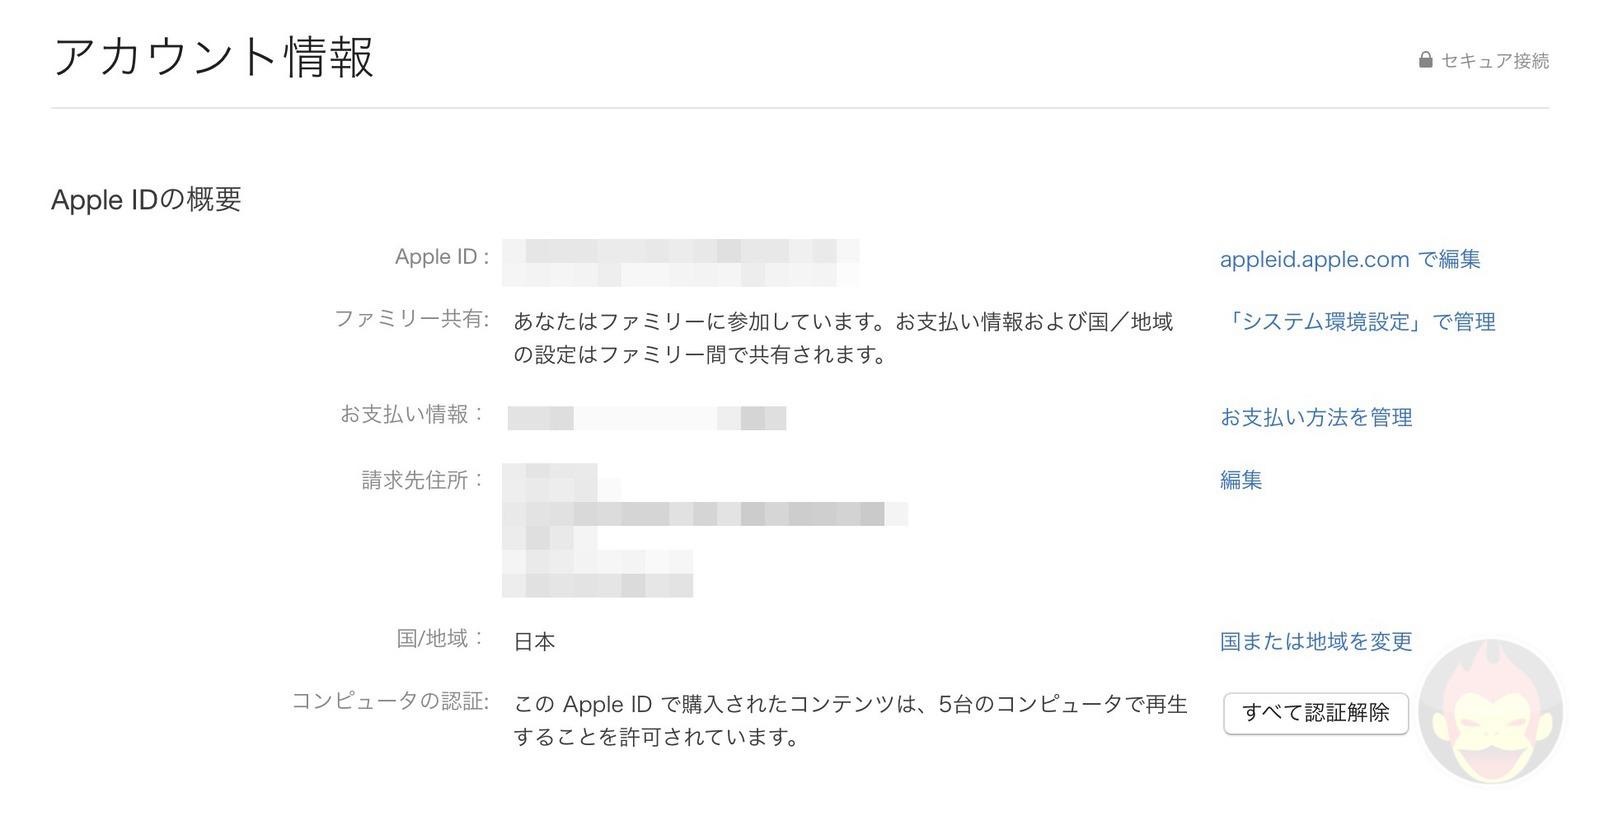 Mac Apple ID Music Account Verification Error 05